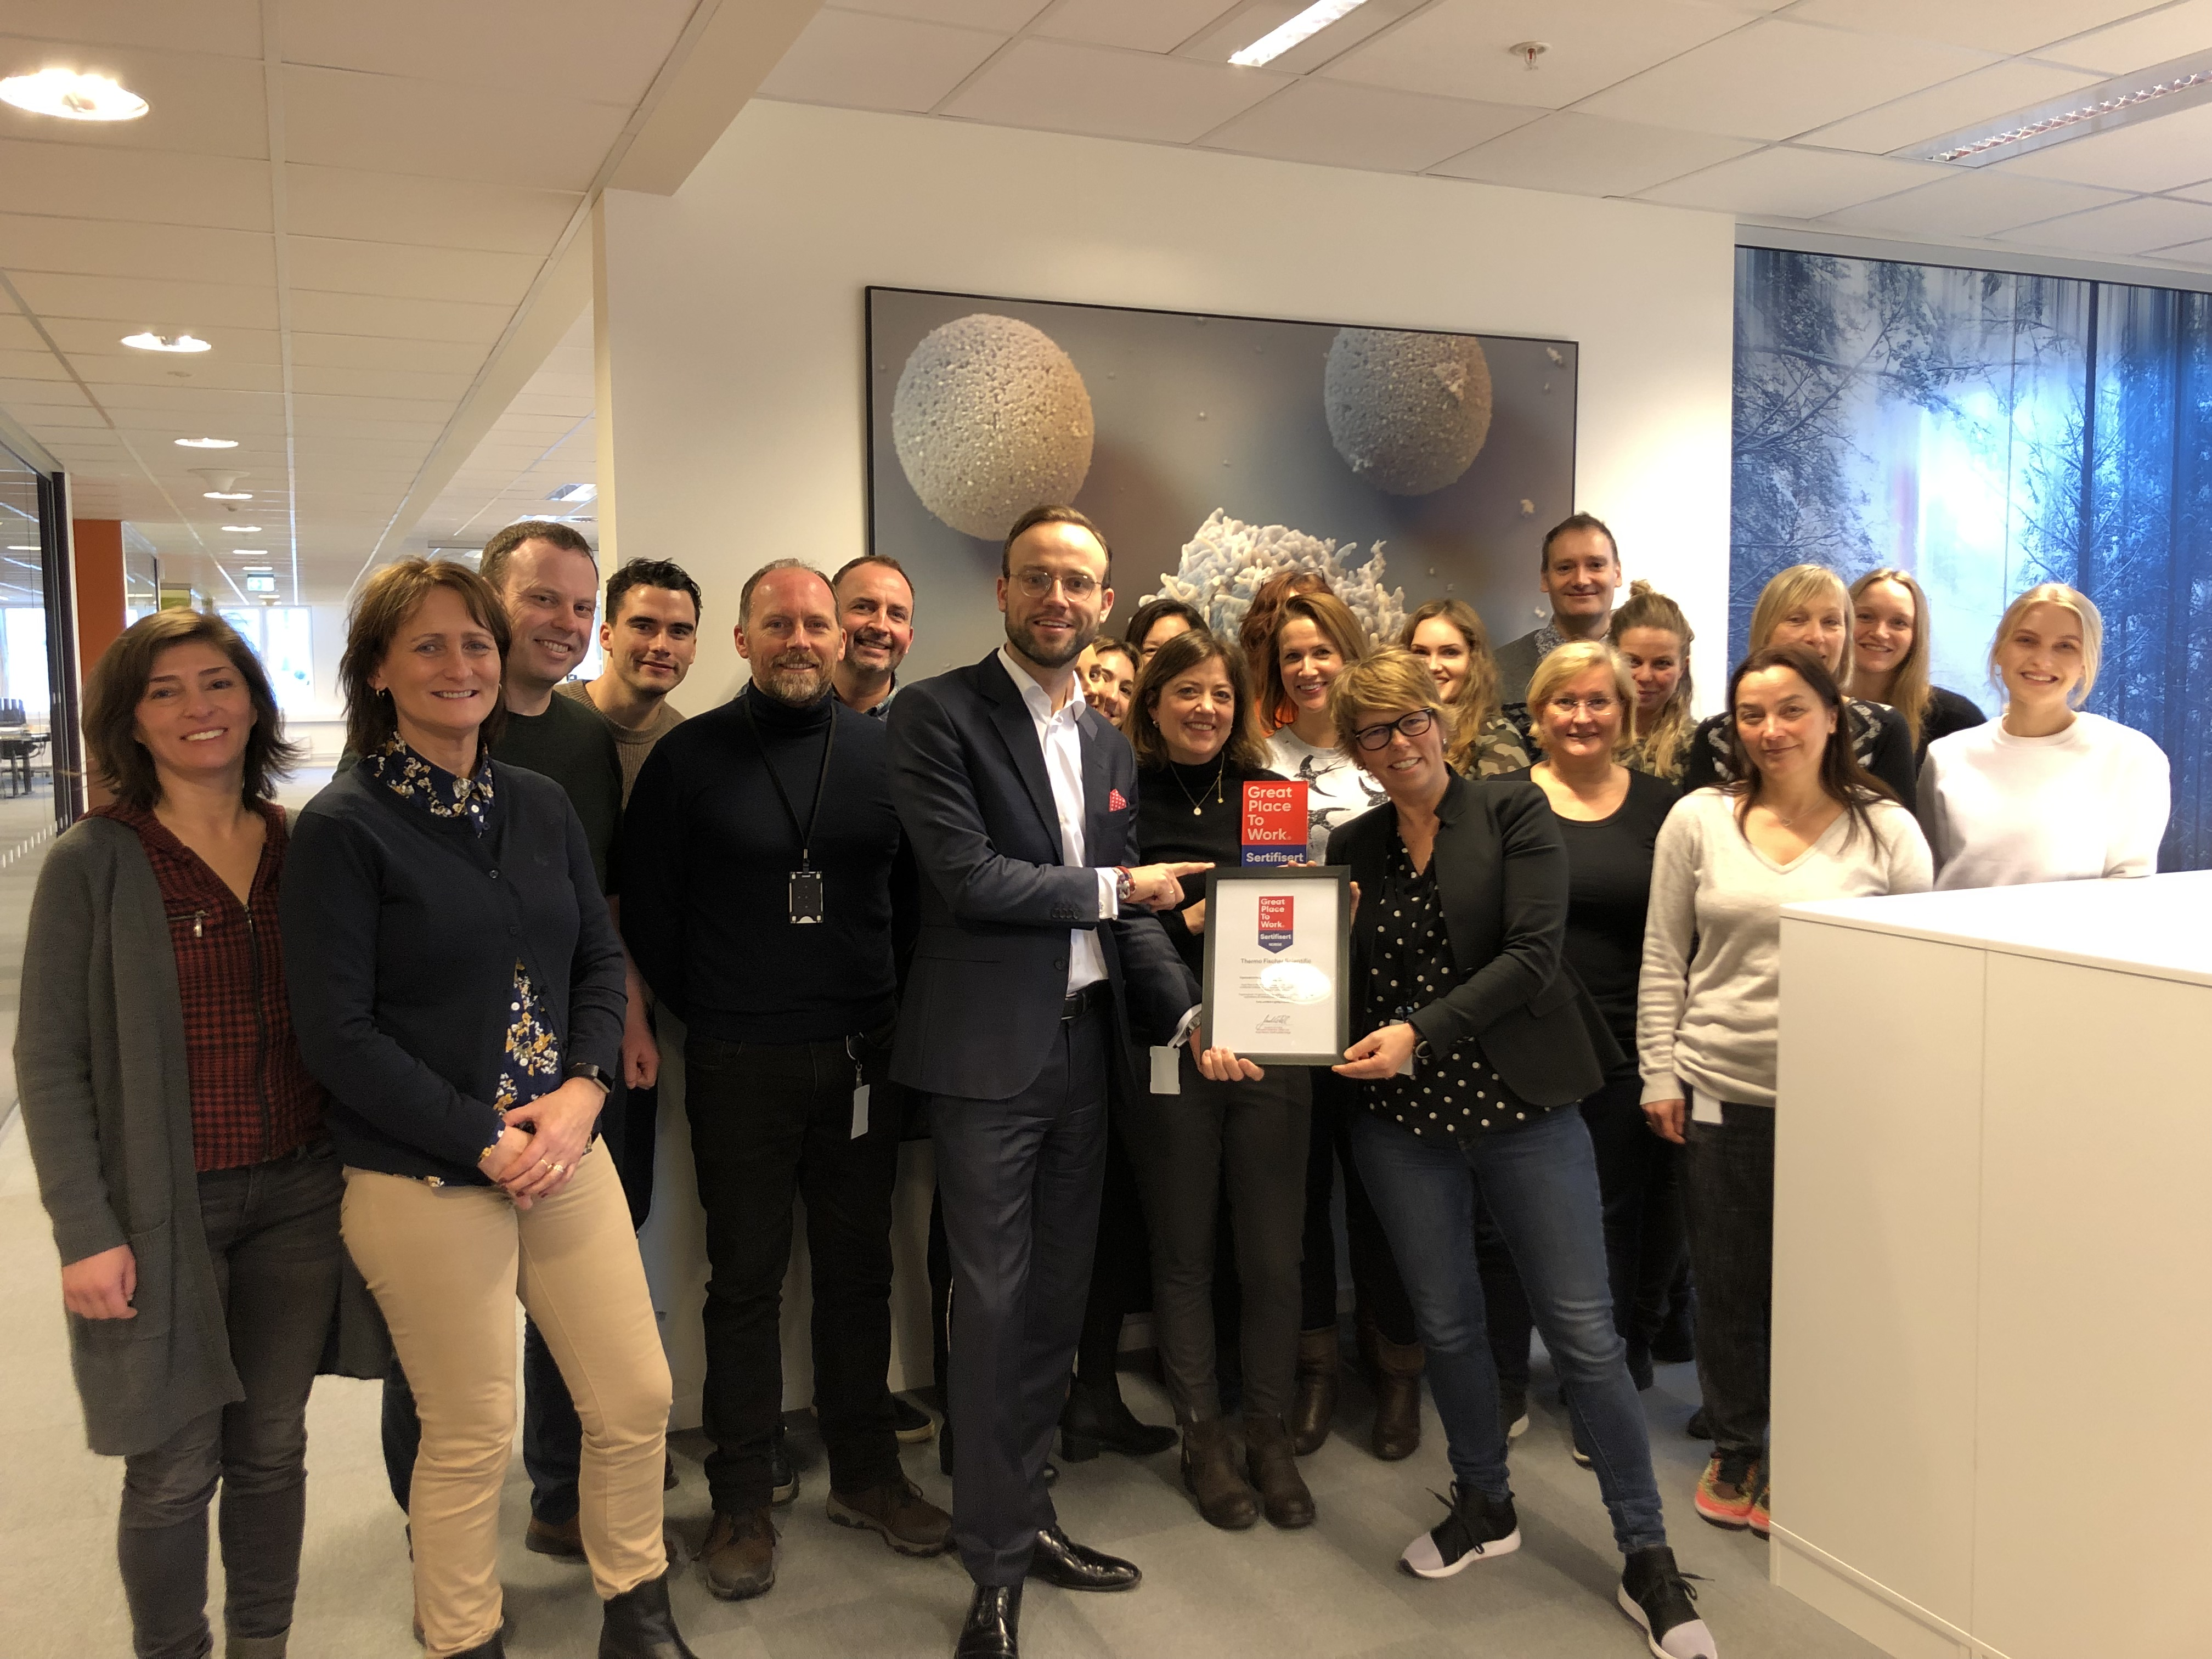 GPTW sertifisering 2019